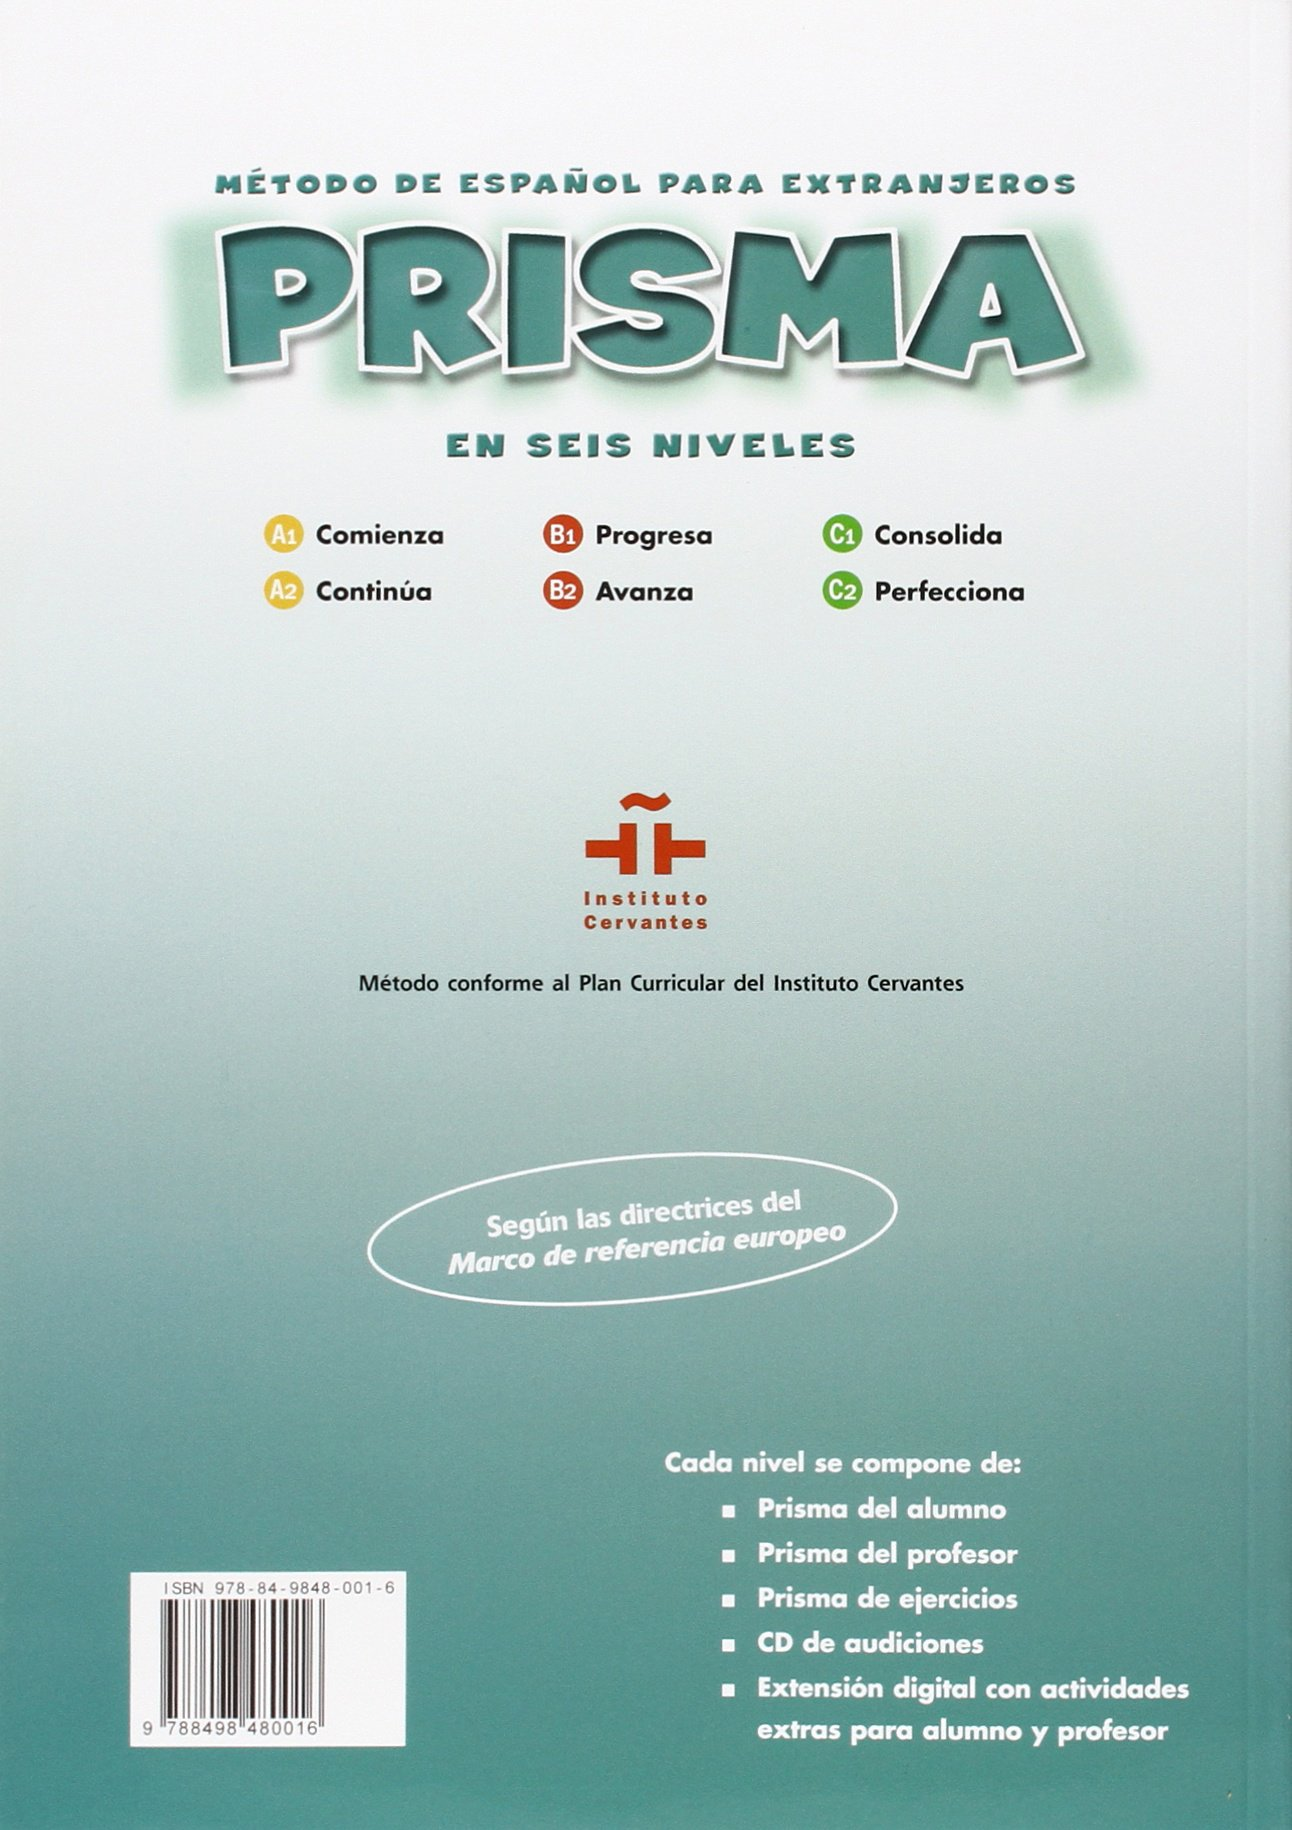 Prisma a2 continua student book cd prisma cd amazon prisma a2 continua student book cd prisma cd amazon club prisma team maria jose gelabert 9788498480016 books fandeluxe Images